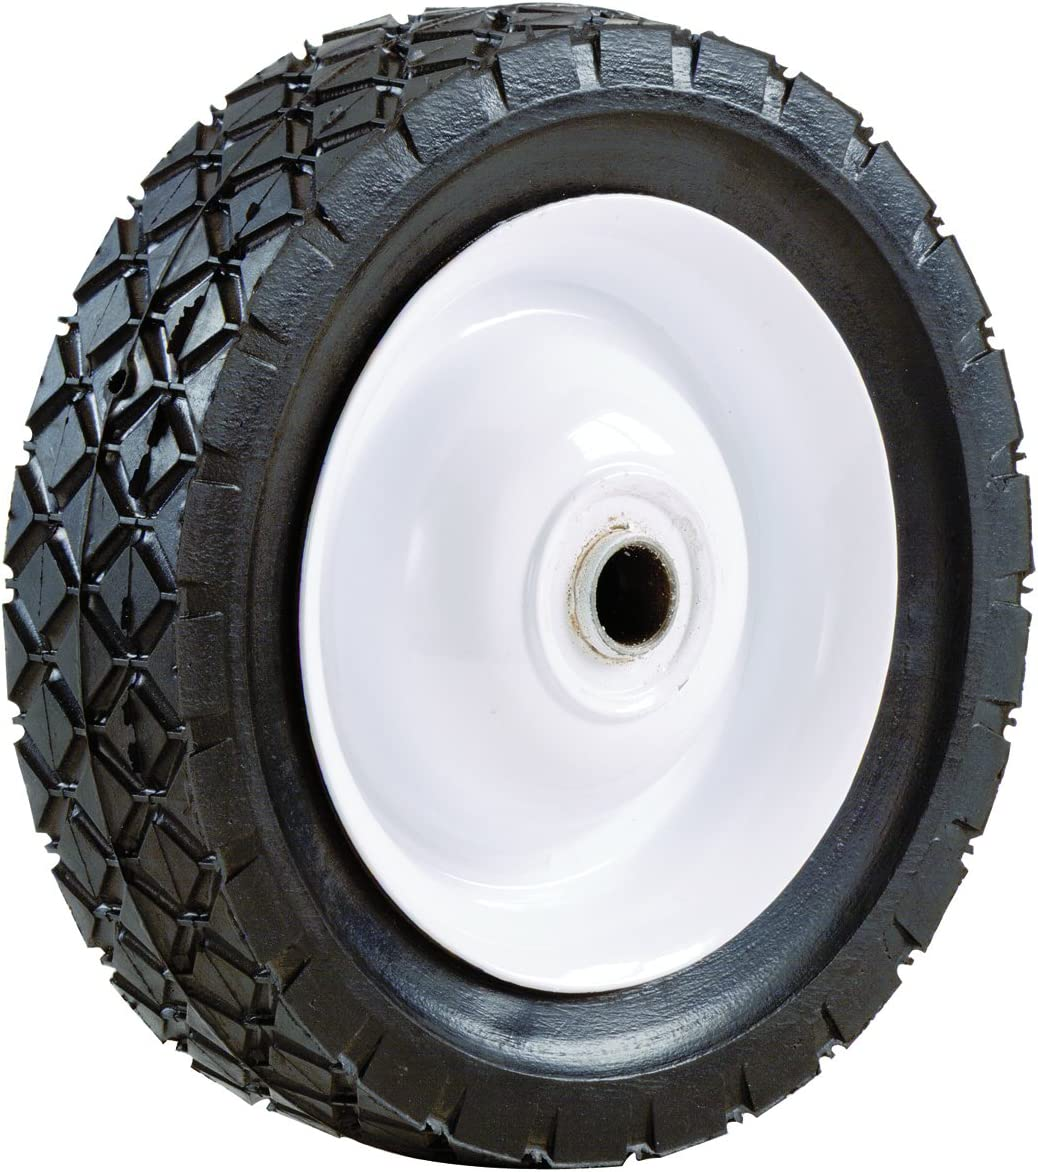 Shepherd 9594 Semi Pneumatic Diamond Tread Replacement Wheels